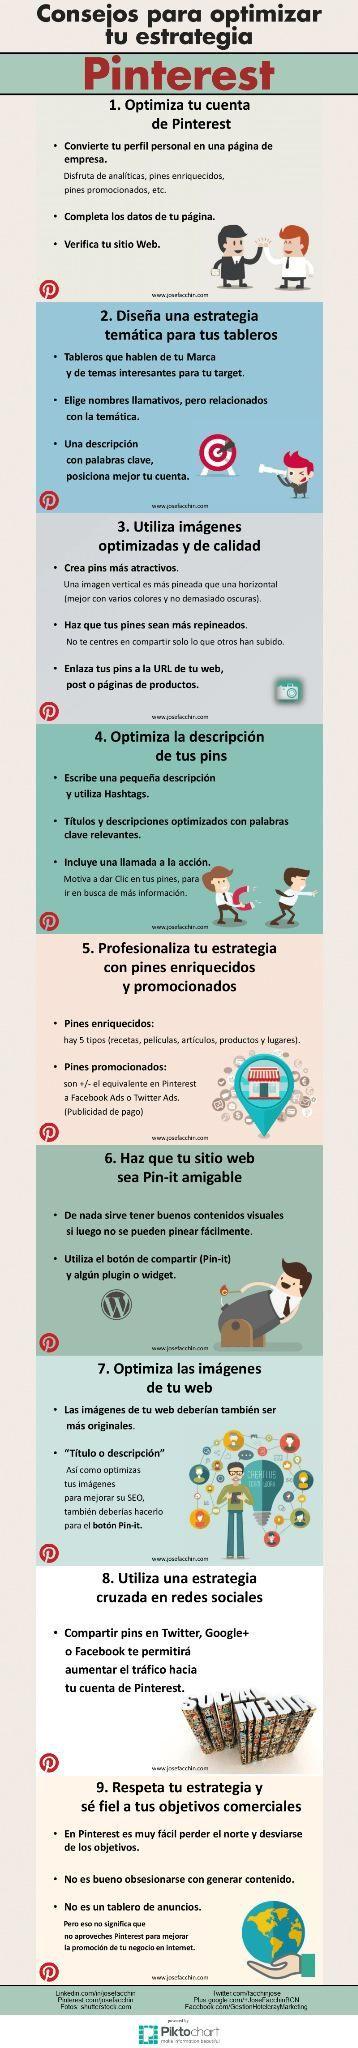 9 consejos para optimizar tu estrategia #Pinterest #infografia #infographic #socialmedia http://wp.me/pxAE1-iA9